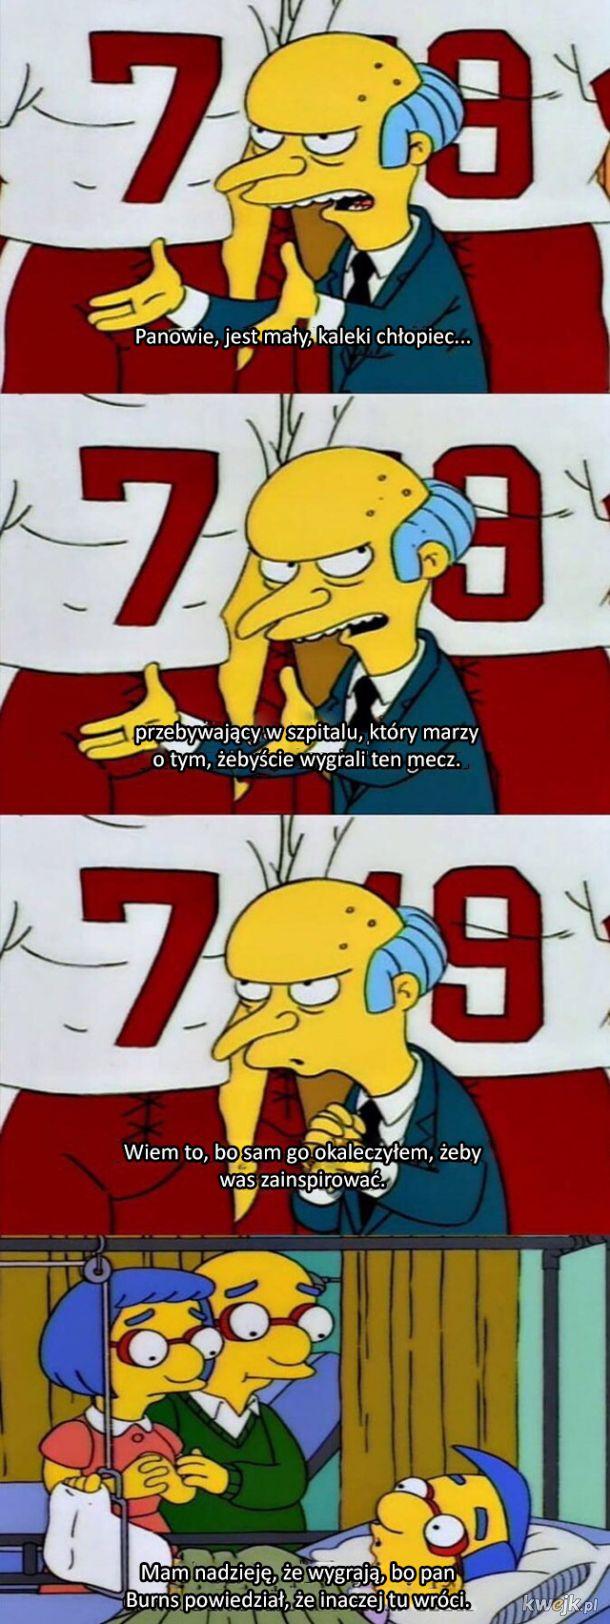 Inspiracja od pana Burnsa